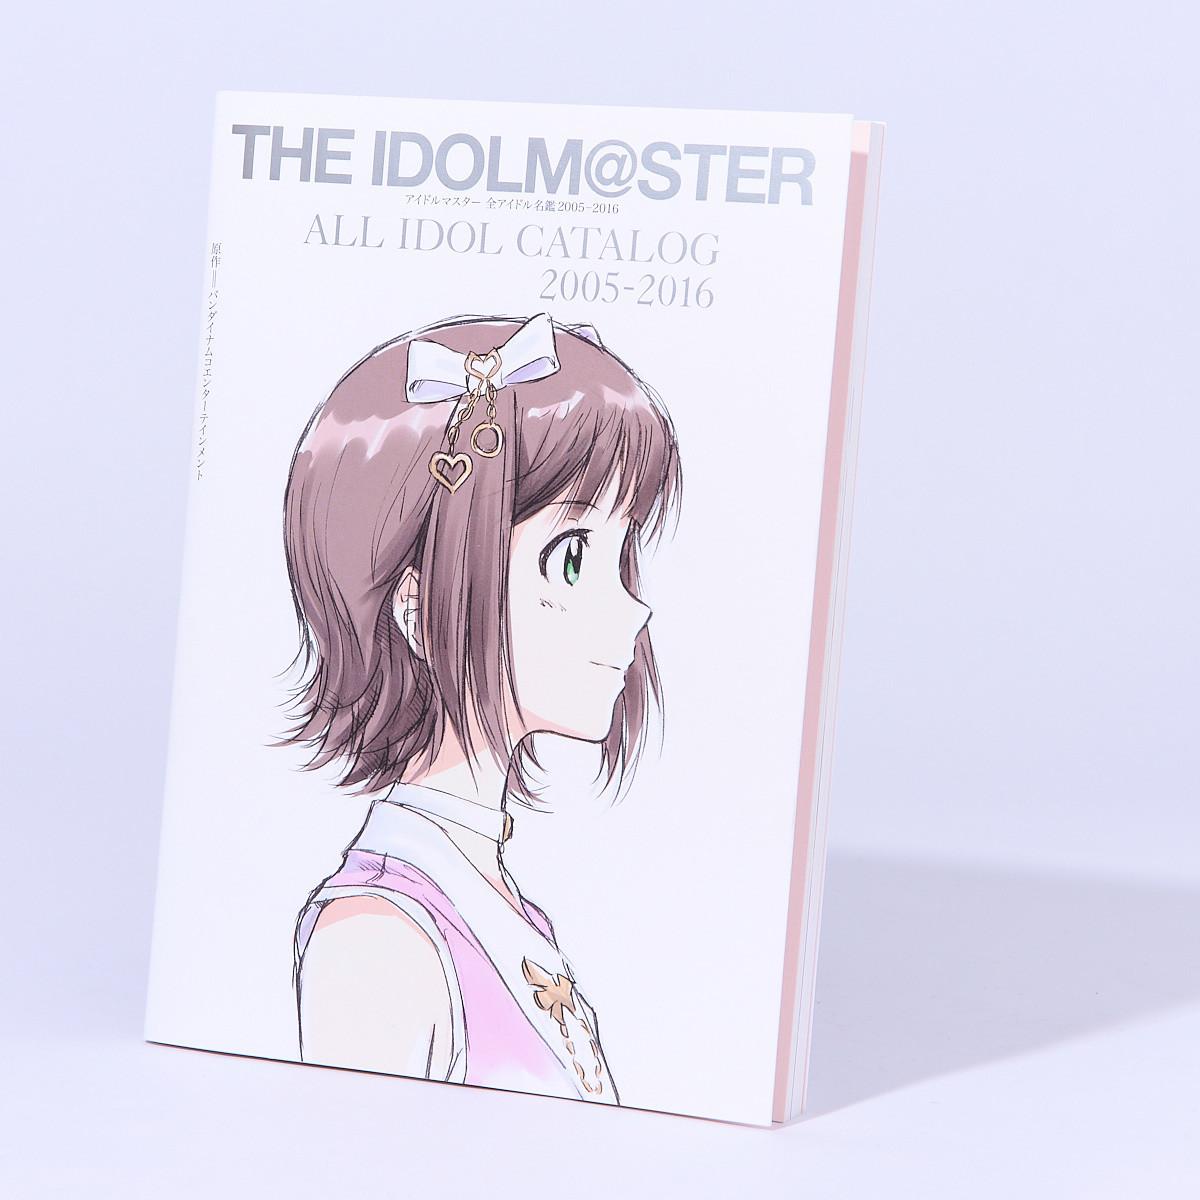 JAPAN The Idolmaster All Idol Catalog 2005-2016 Book